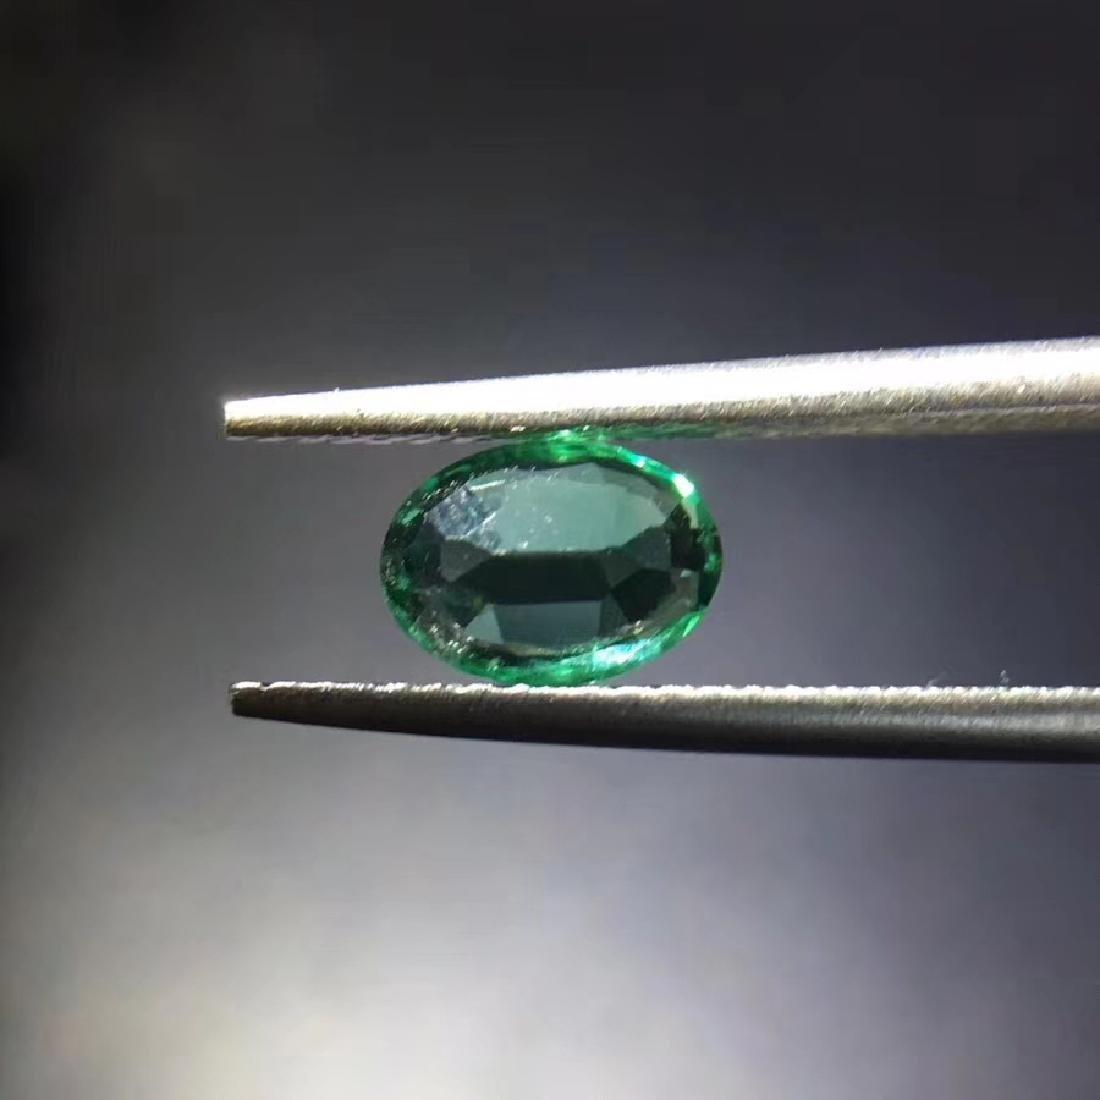 0.73 ct Emerald 5.0*7.0*2.9 mm Oval Cut - 4